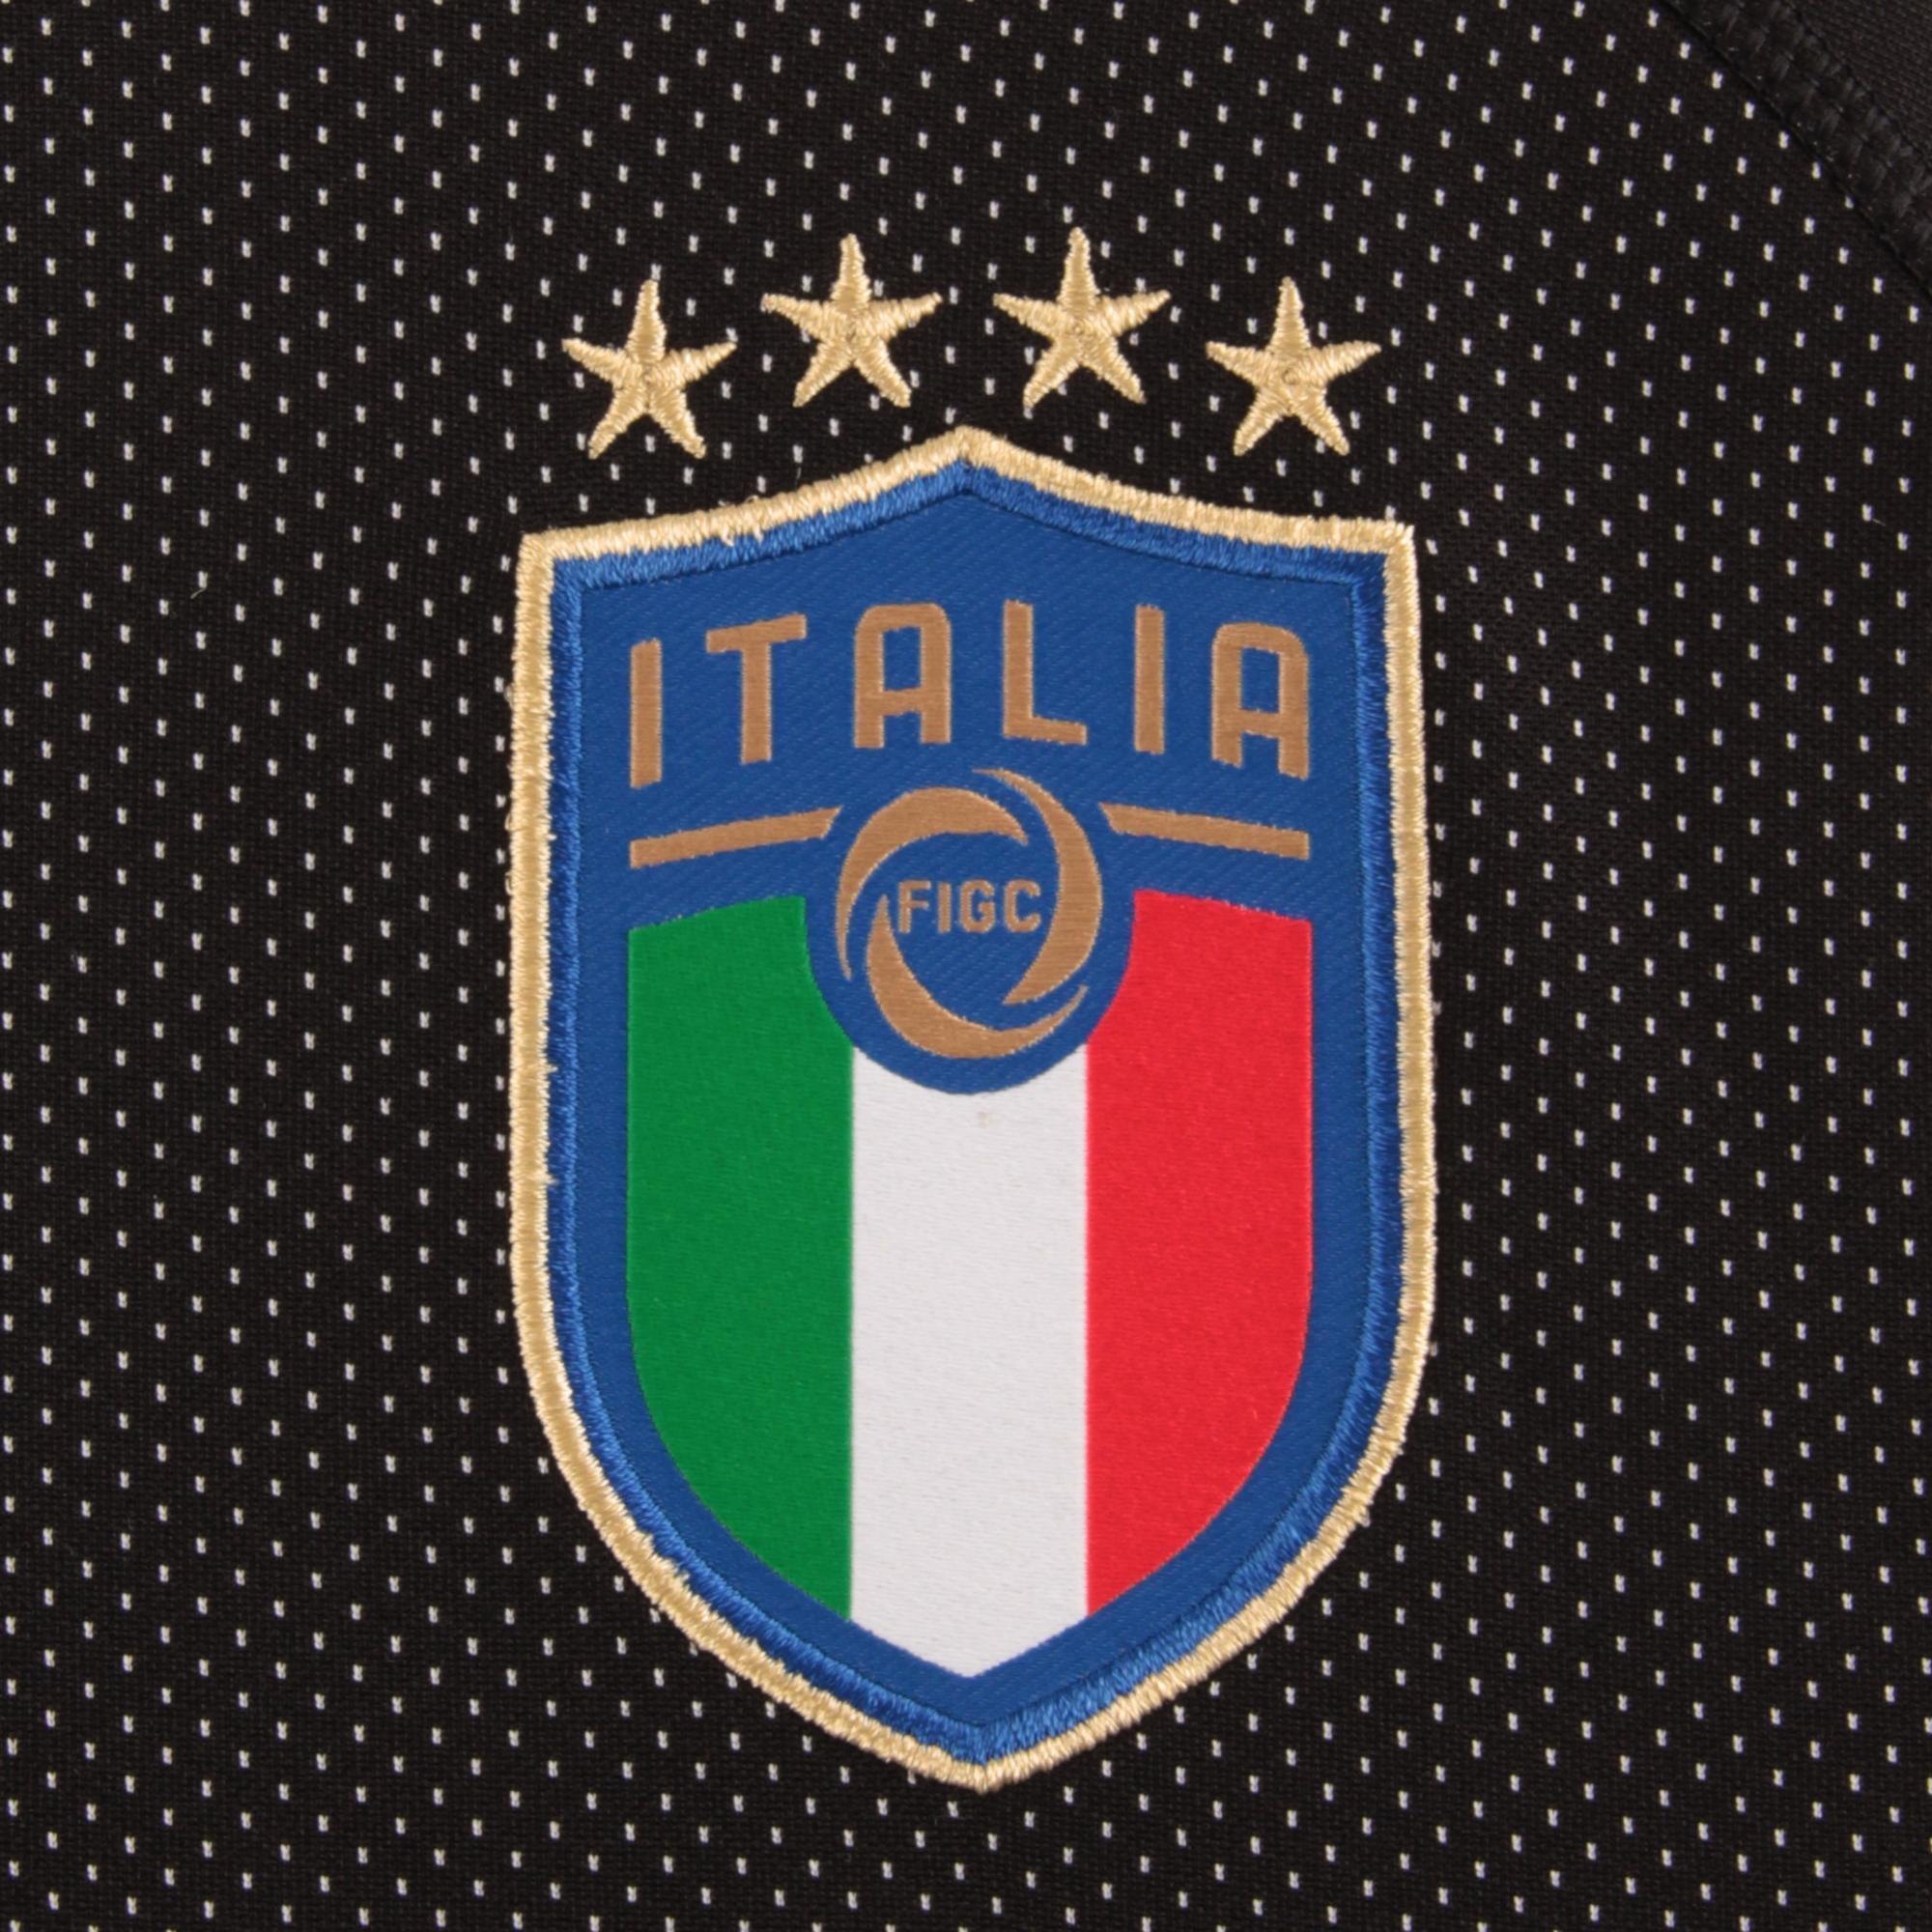 7d9889e552d Figc Italia Goalkeeper Shirt Replica Ss FIGC Store